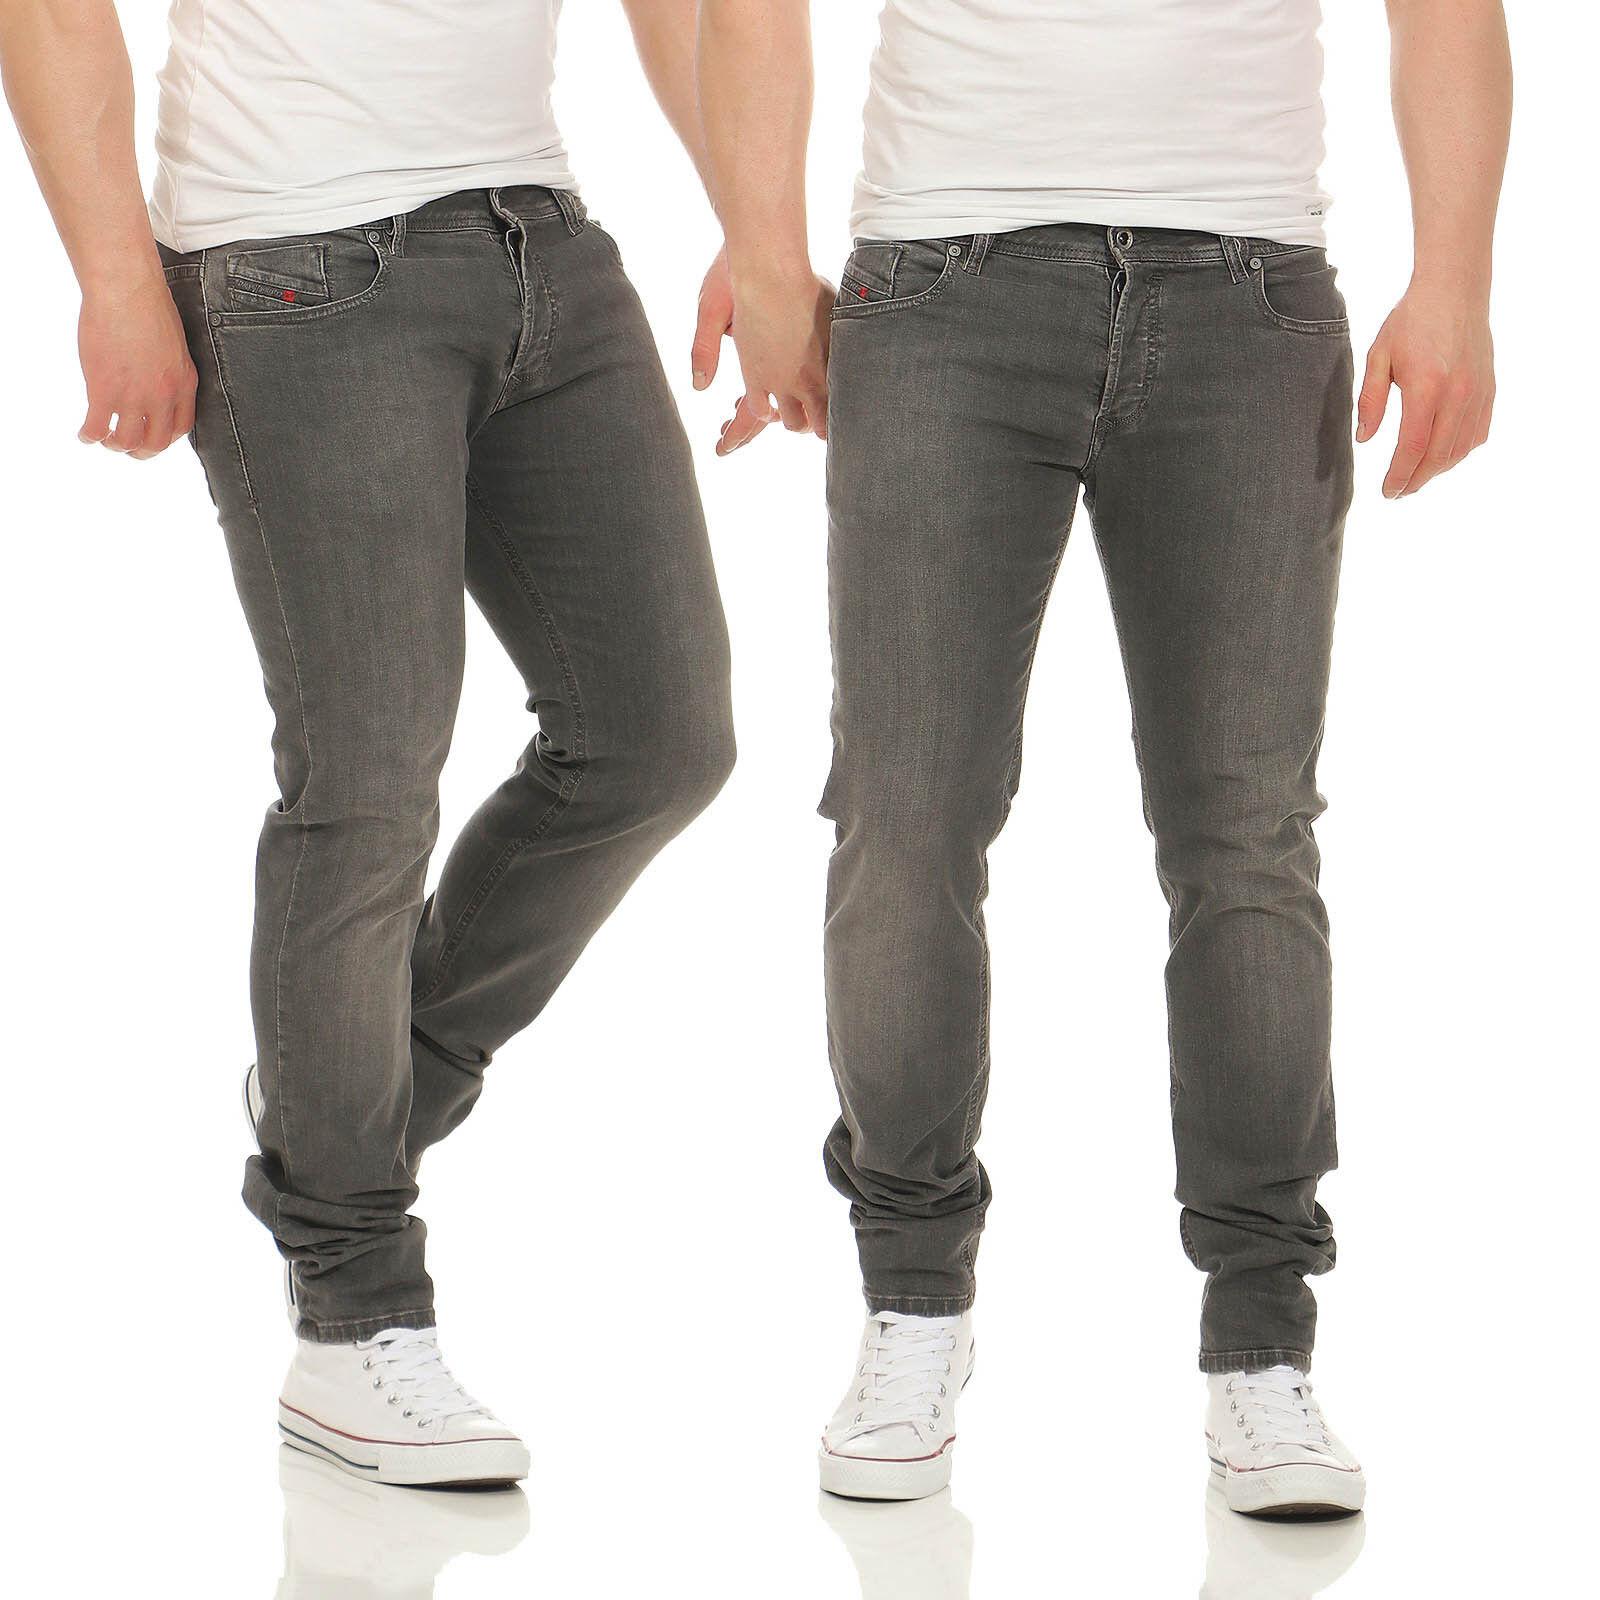 Diesel Jeans Sleenker 0678Z Herren Hose Slim Skinny Grau Stretch Röhrenjeans | Hervorragende Eigenschaften  | New Listing